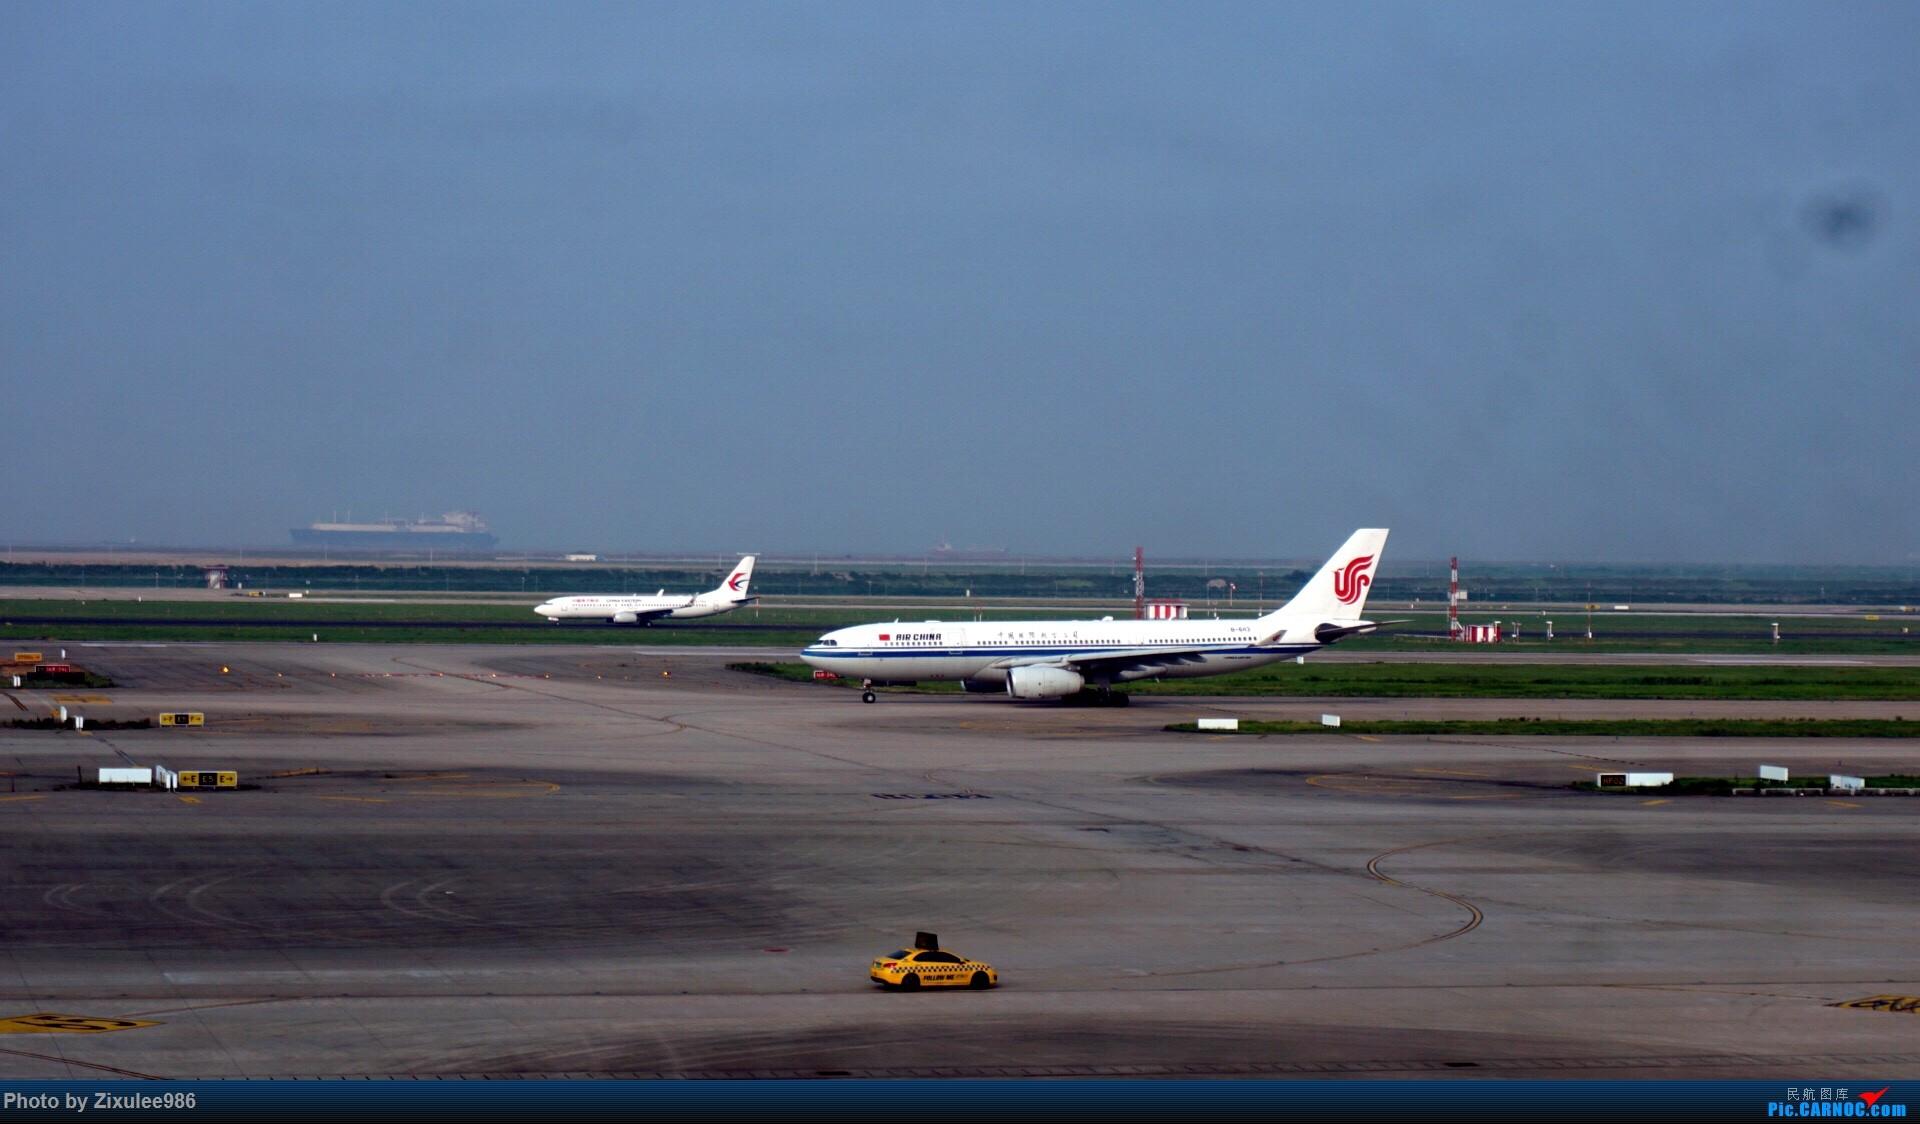 Re:[原创]加拿大21日游学之旅(一)~JJN-PVG-YYZ..(内含flightlog)~第一次发游记~多图缓更请谅解 AIRBUS A330-200 B-6113 中国上海浦东国际机场